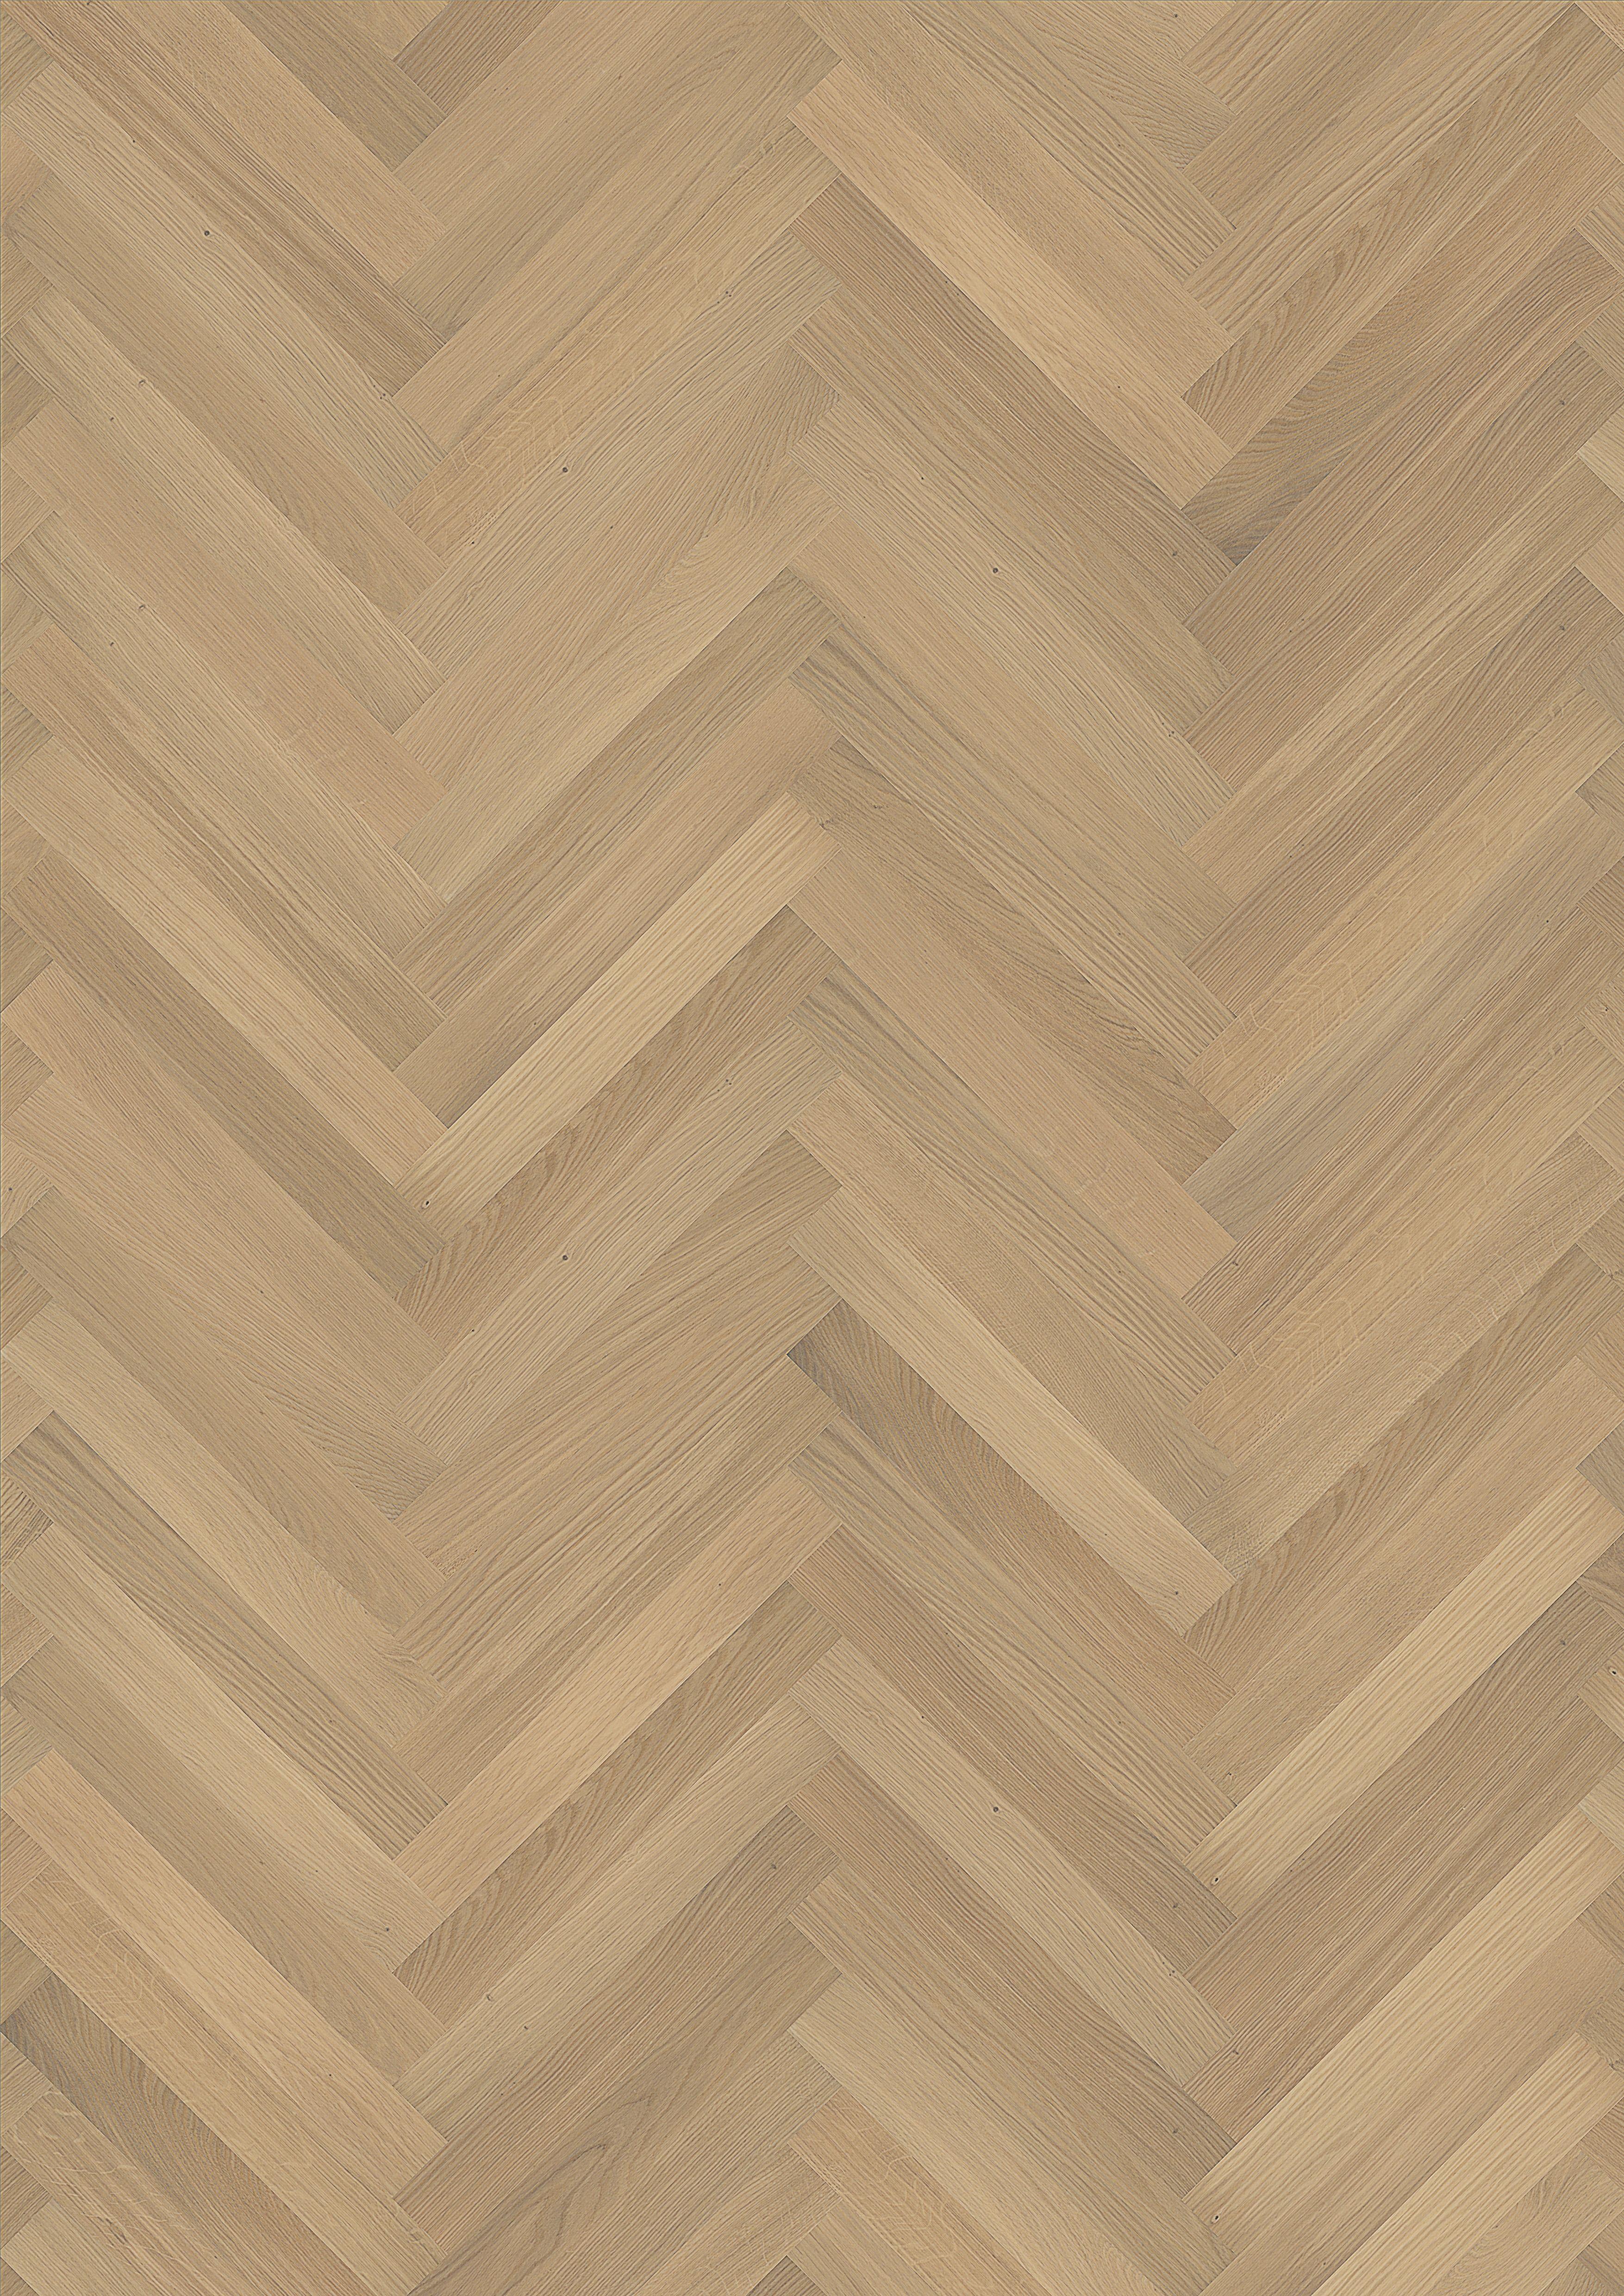 Kahrs White Oak Herringbone White Herringbone Scandinavian Patterned Wood Parquet Flooring Www K Engineered Wood Floors Wood Floor Texture Herringbone Wood